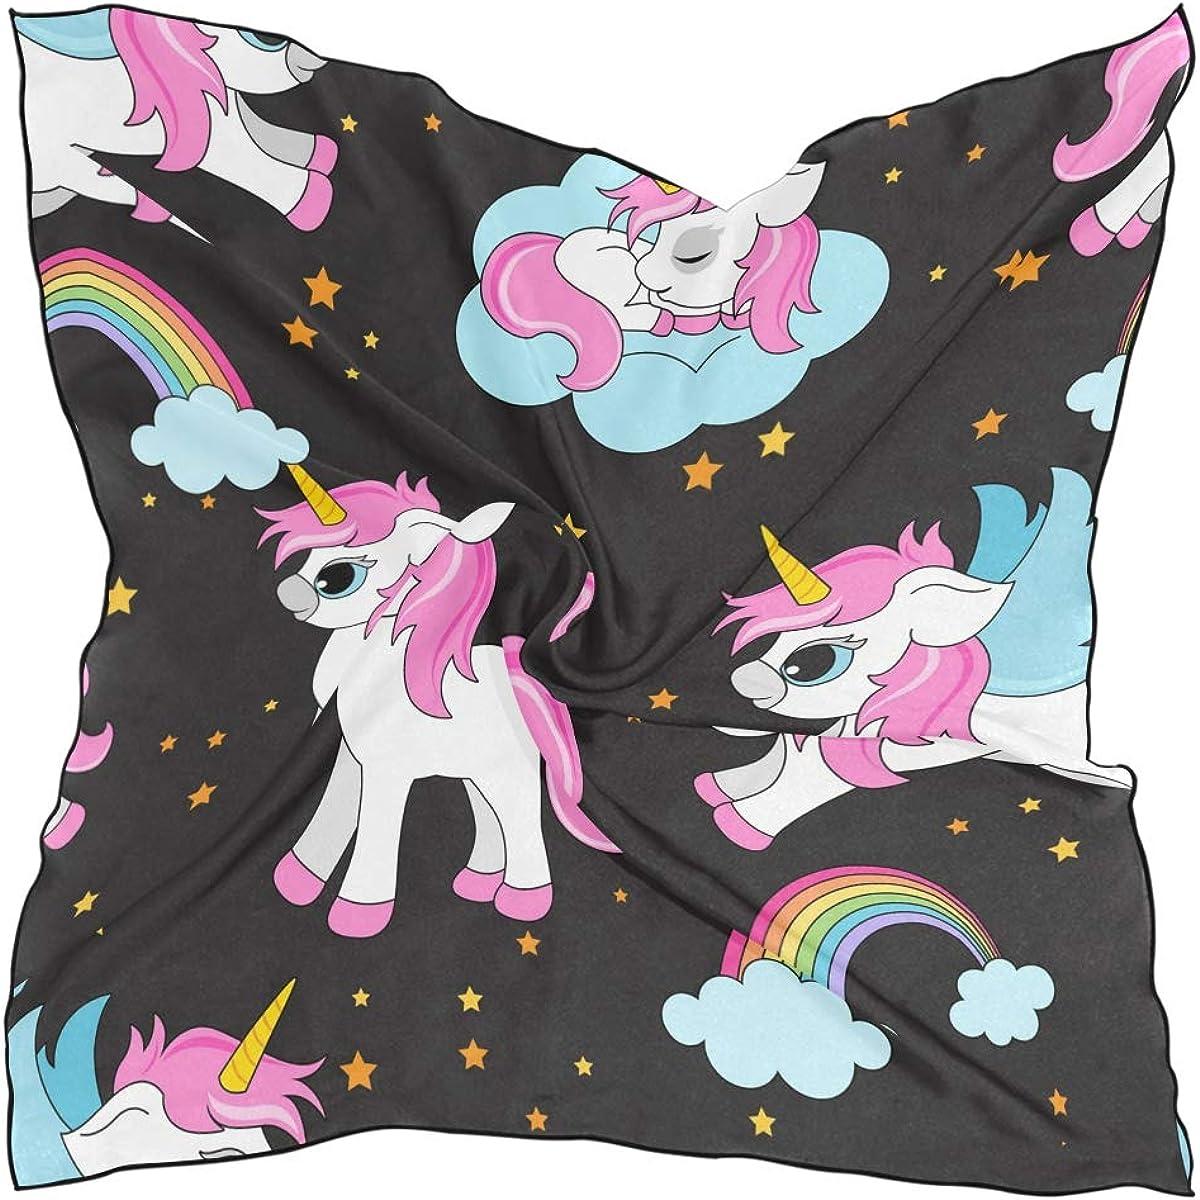 XLING Fashion Square Scarf Cute Galaxy Animal Unicorn Rainbow Lightweight Sunscreen Scarves Muffler Hair Wrap Headscarf Neckerchief for Women Men